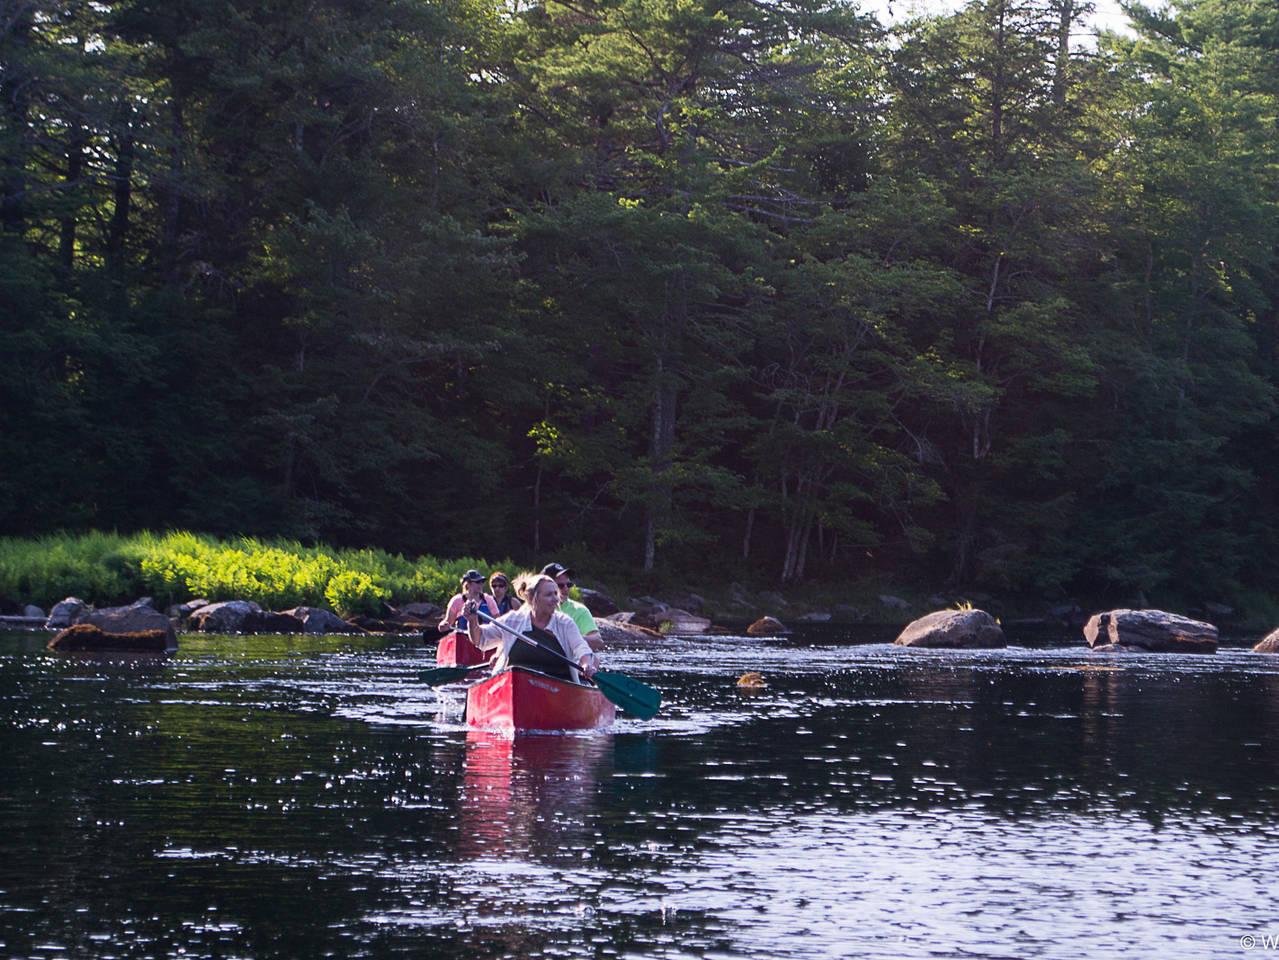 Canoe armada on the Mersey River